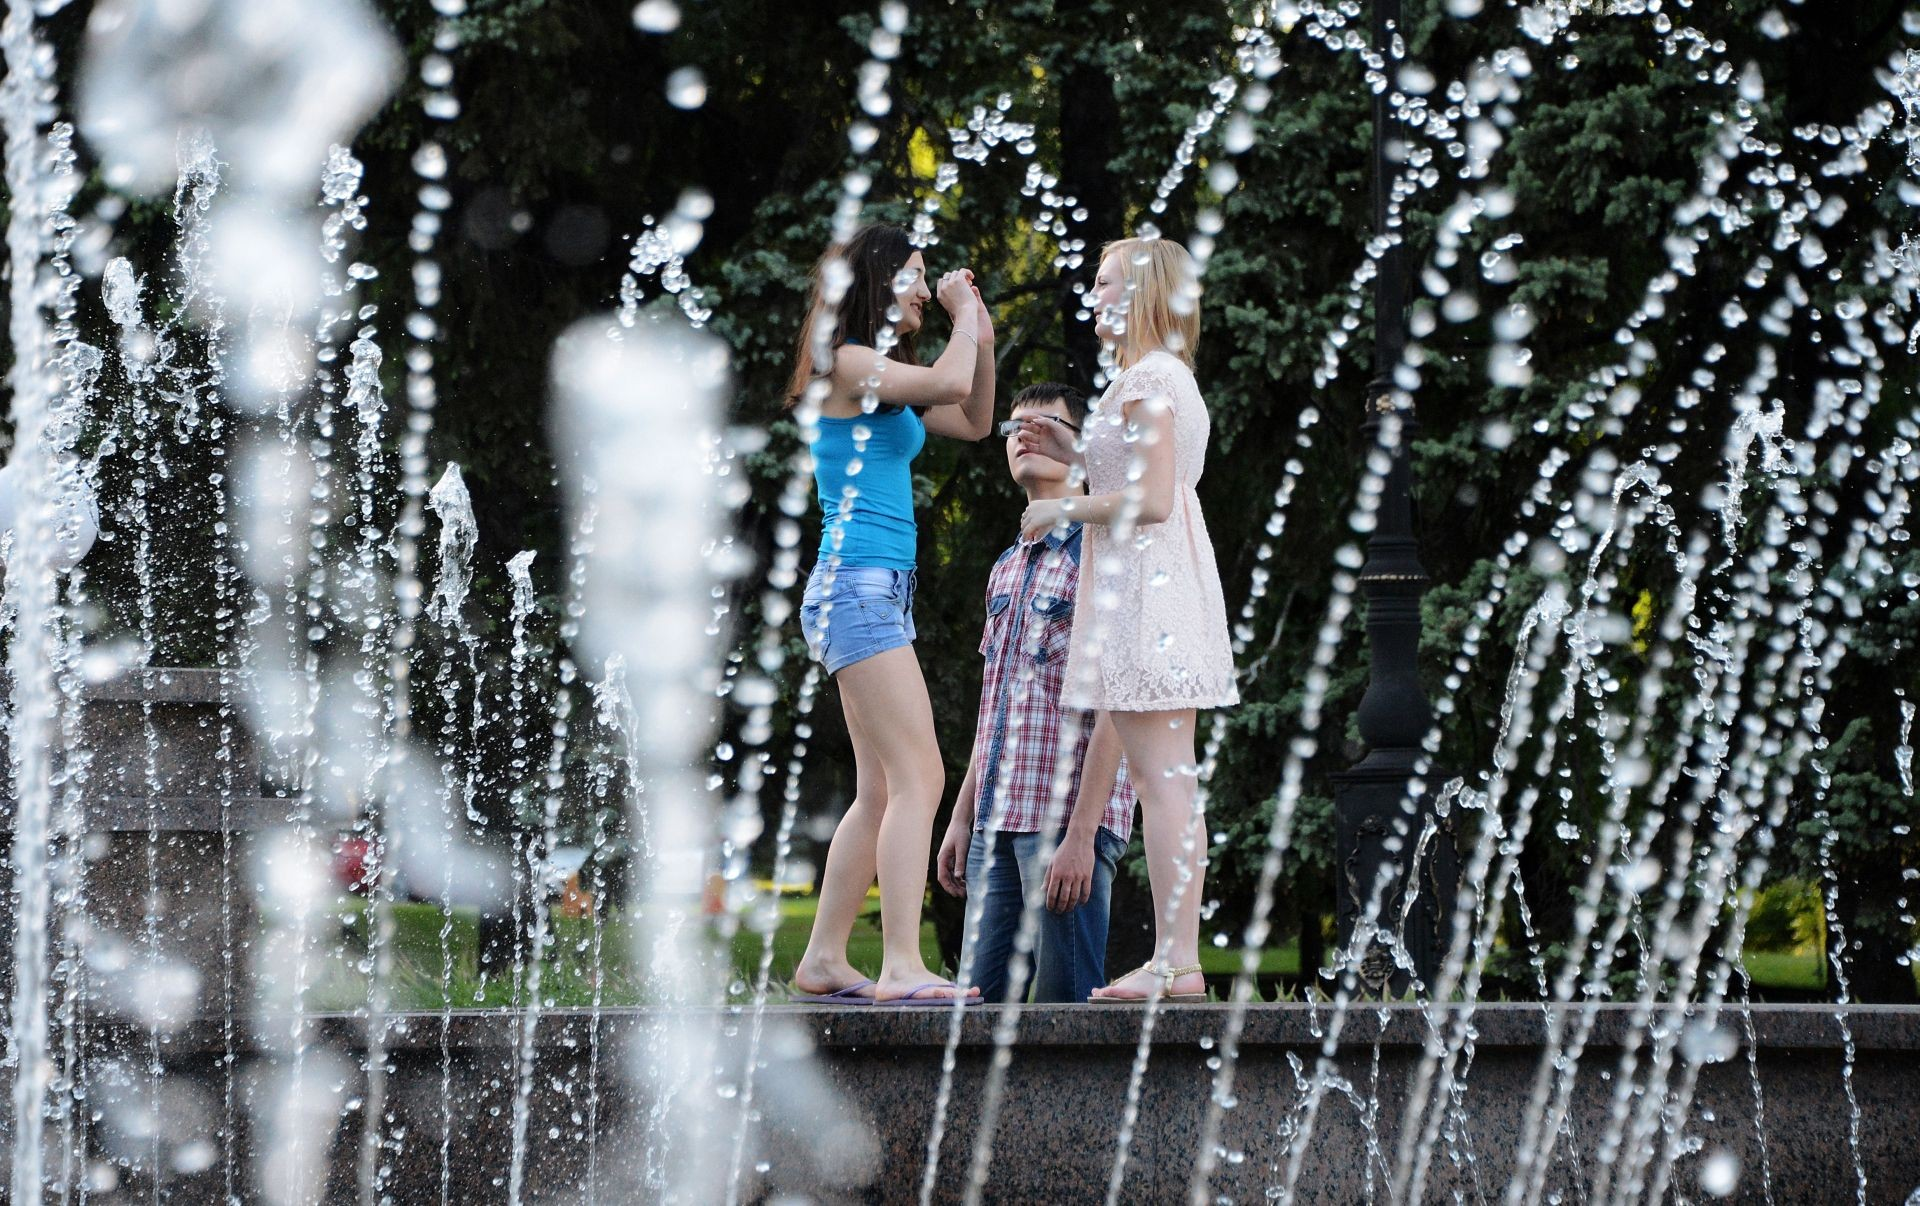 <p>Фото: &copy; РИА Новости/Наталья Селиверстова</p> <p>&nbsp;</p>